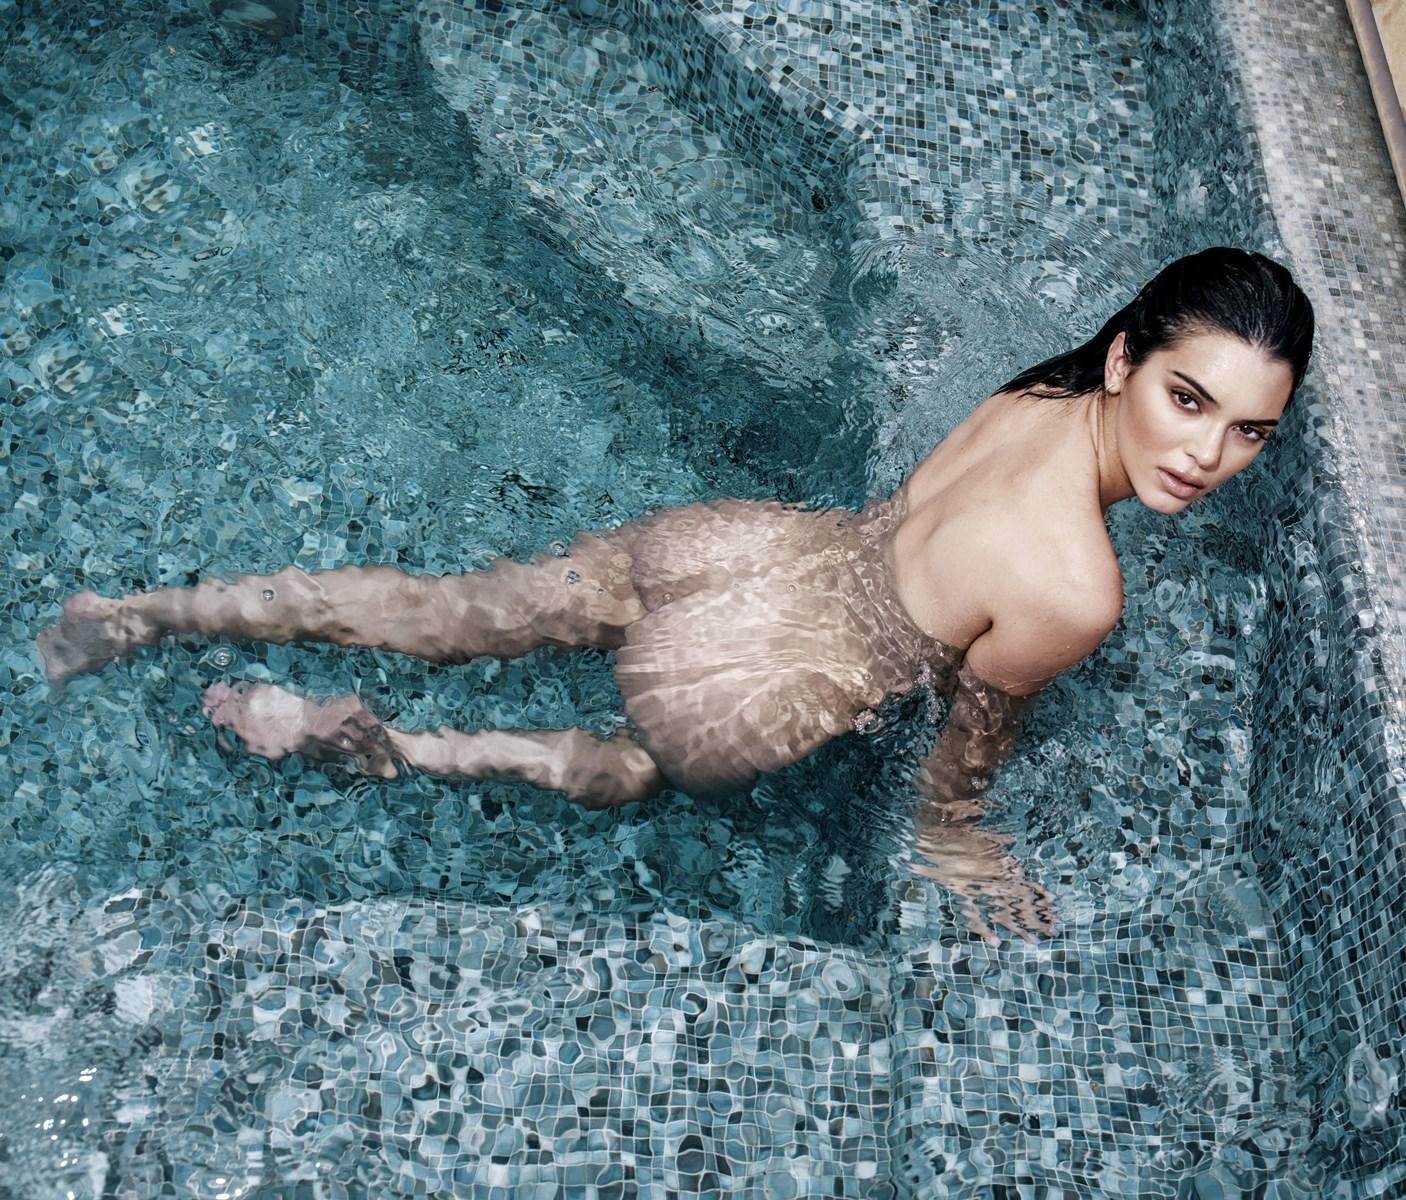 Kendall Jenner hot image